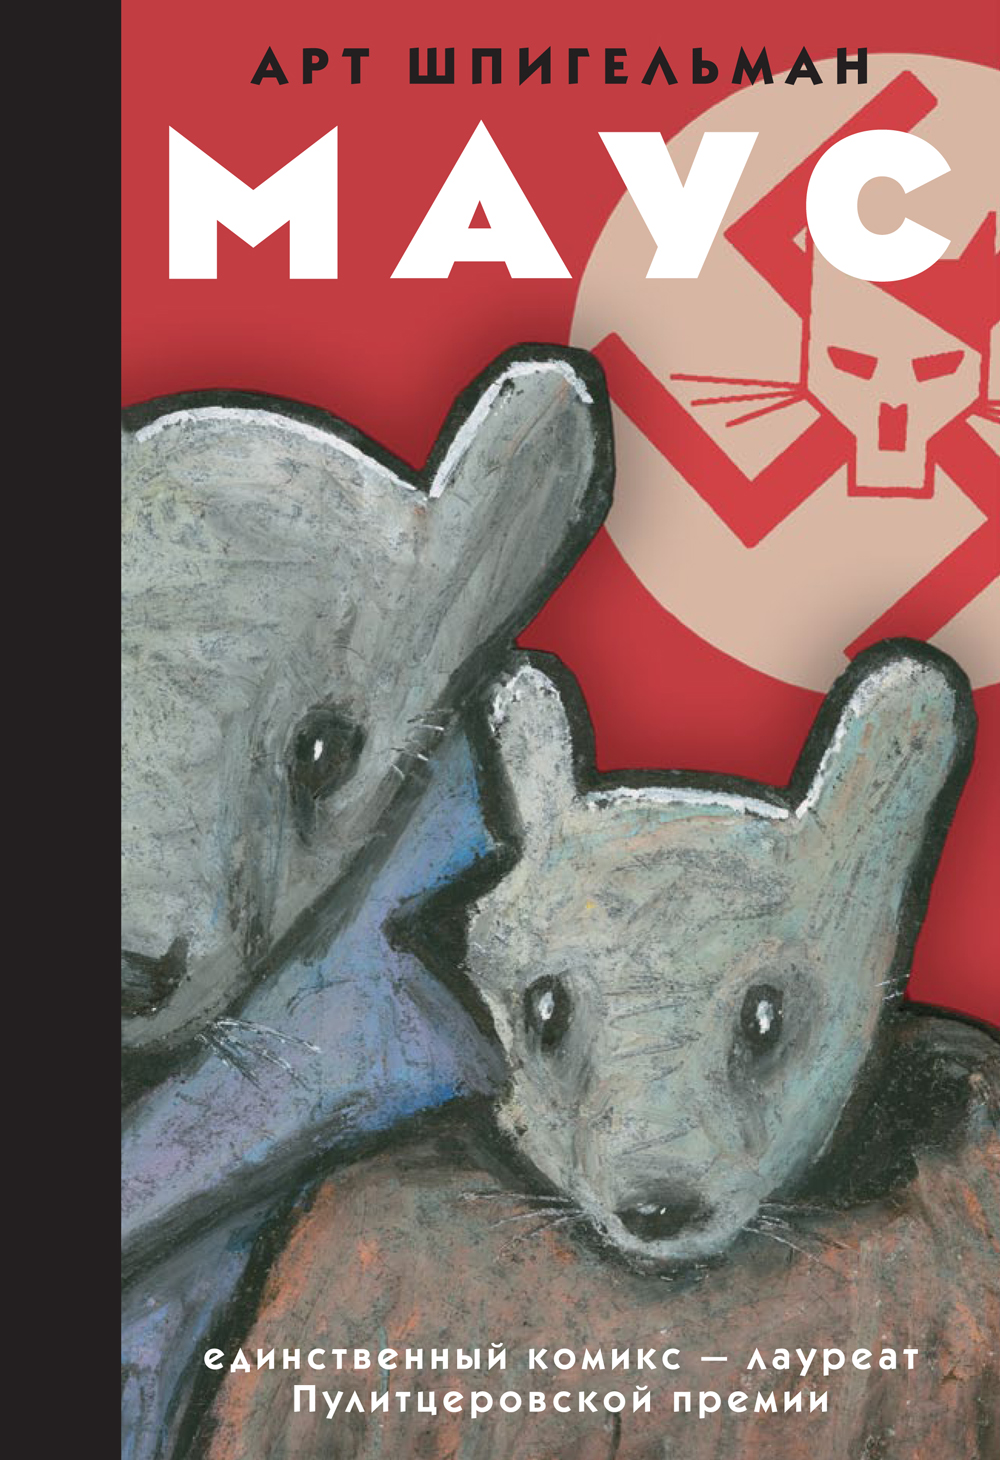 Маус, Комикс | Графический роман